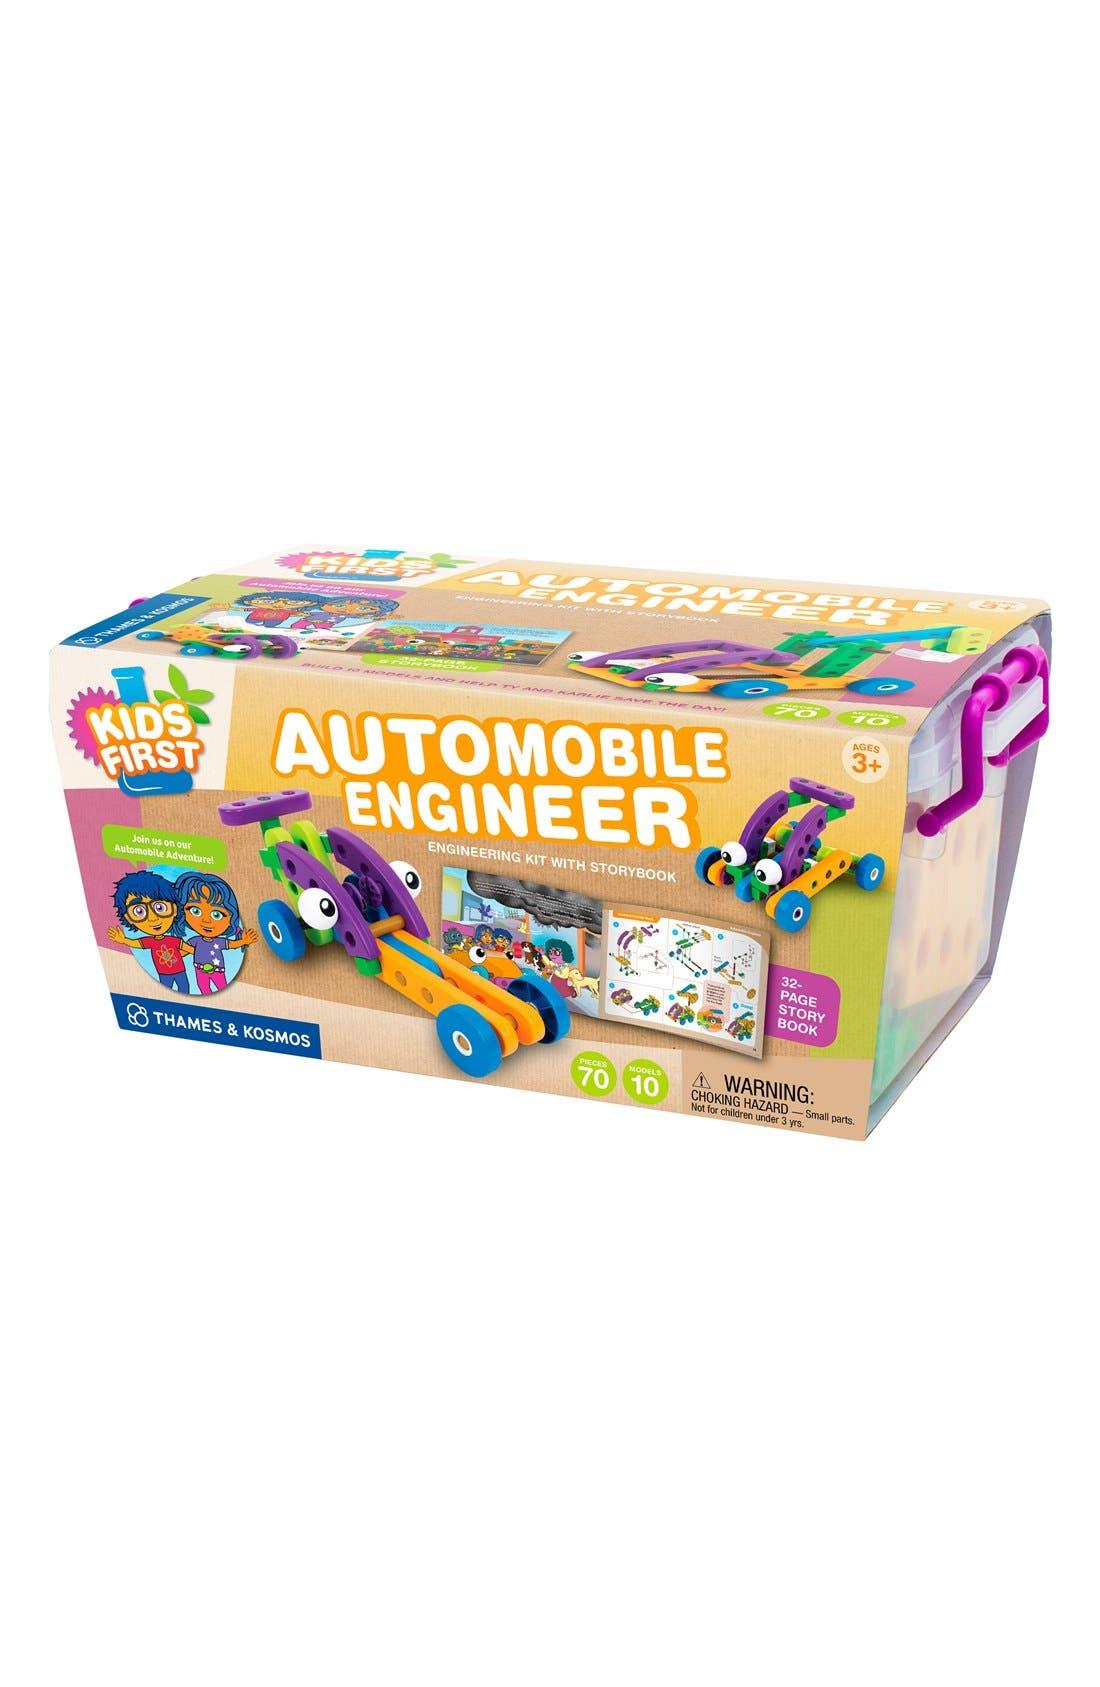 'Kids First - Automobile Engineer' Kit,                             Main thumbnail 1, color,                             ORANGE